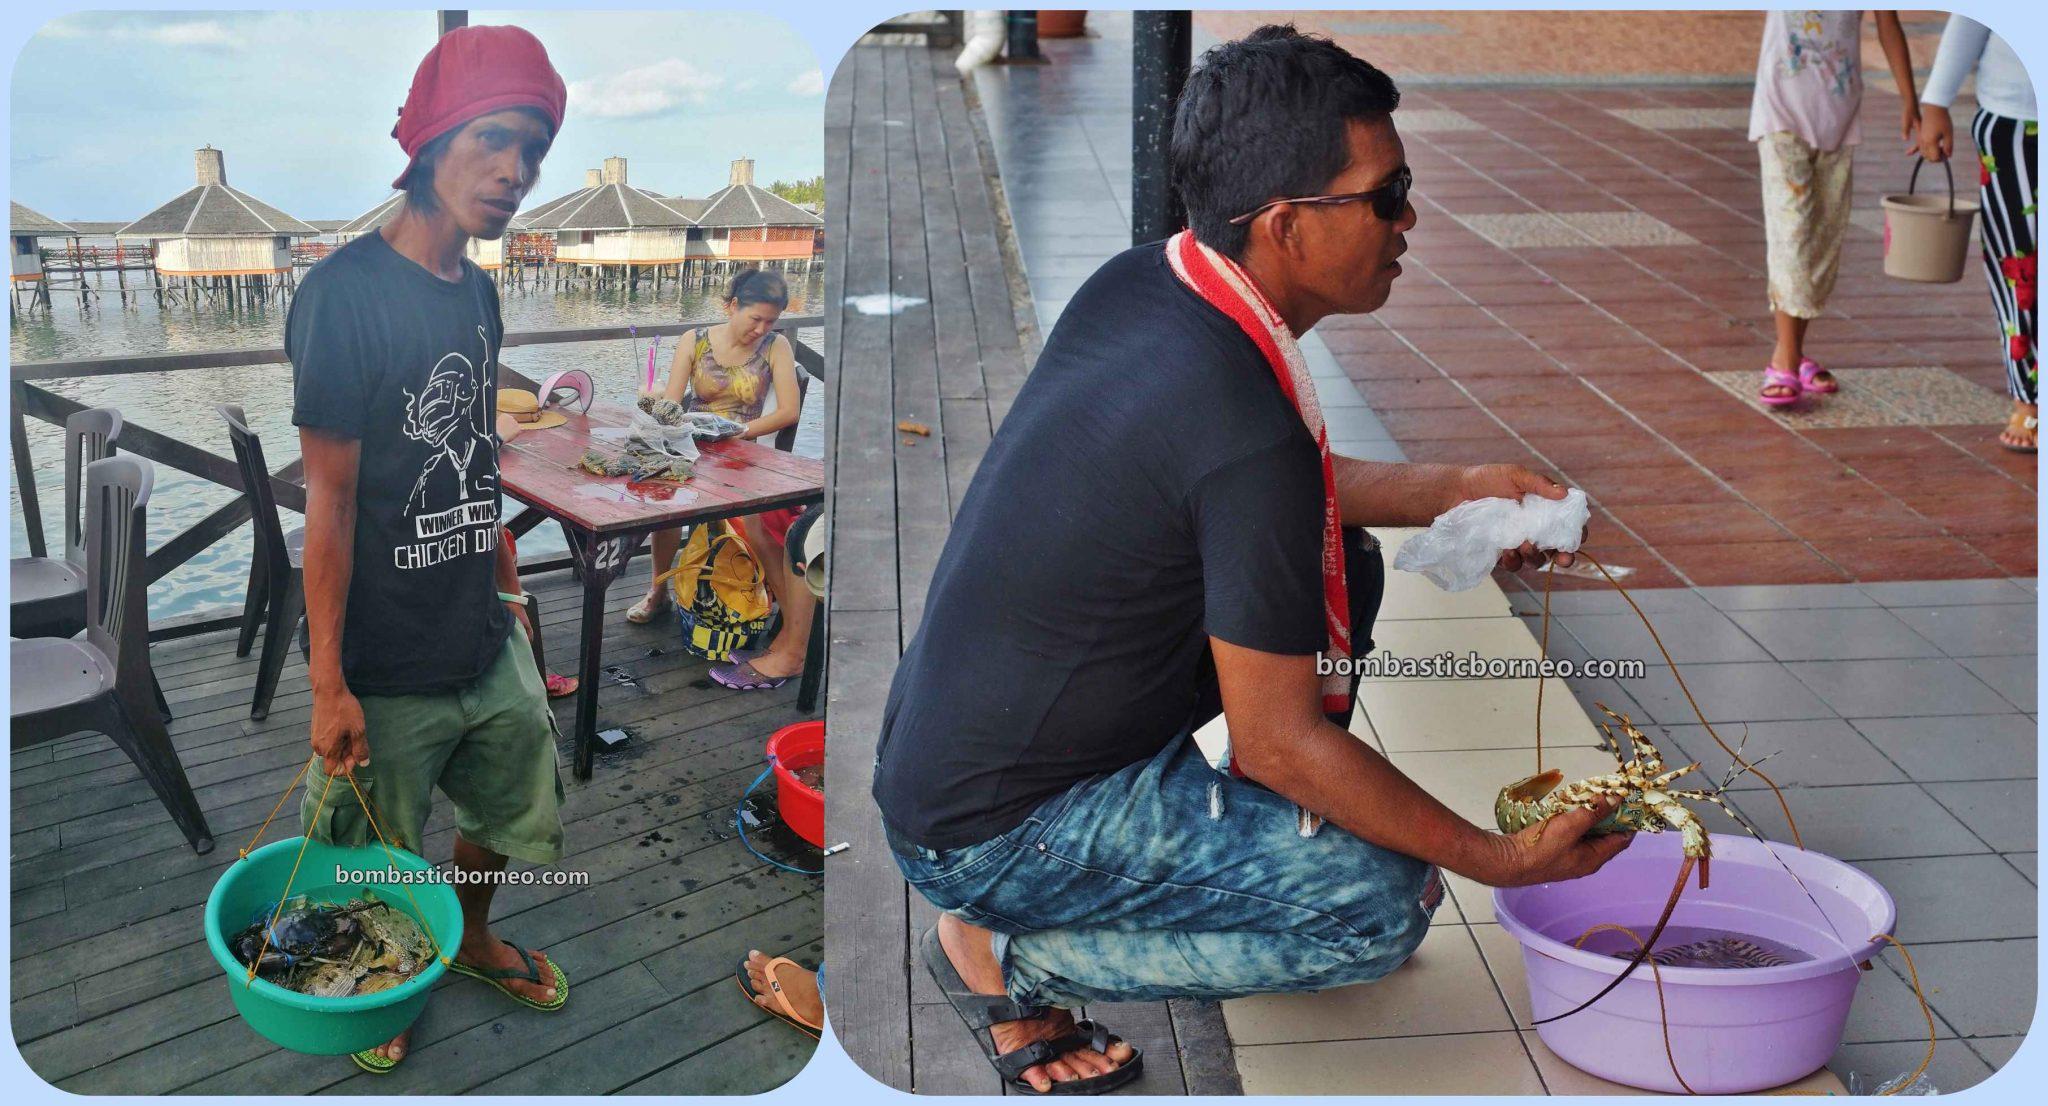 makanan laut, Pesta Regatta Lepa, backpackers, destination, Sea Gypsies, ethnic, Tourism, tourist attraction, travel guide, Cross Border, Borneo, 穿越婆罗洲游踪, 马来西亚沙巴海鲜, 仙本那海吉普赛人